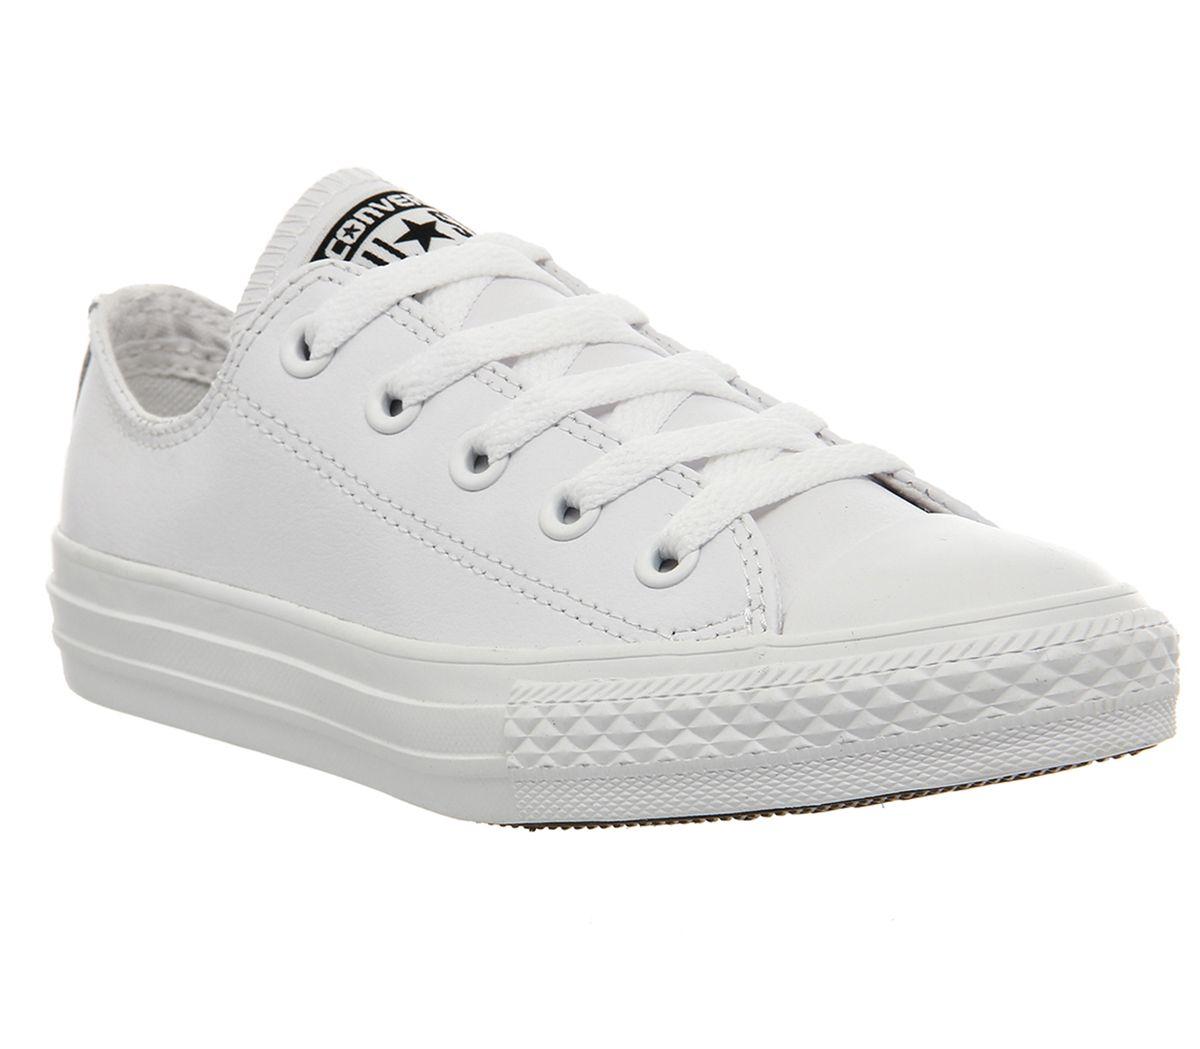 5634e311271f Converse All Star Ox Leather Kids White Mono - Unisex